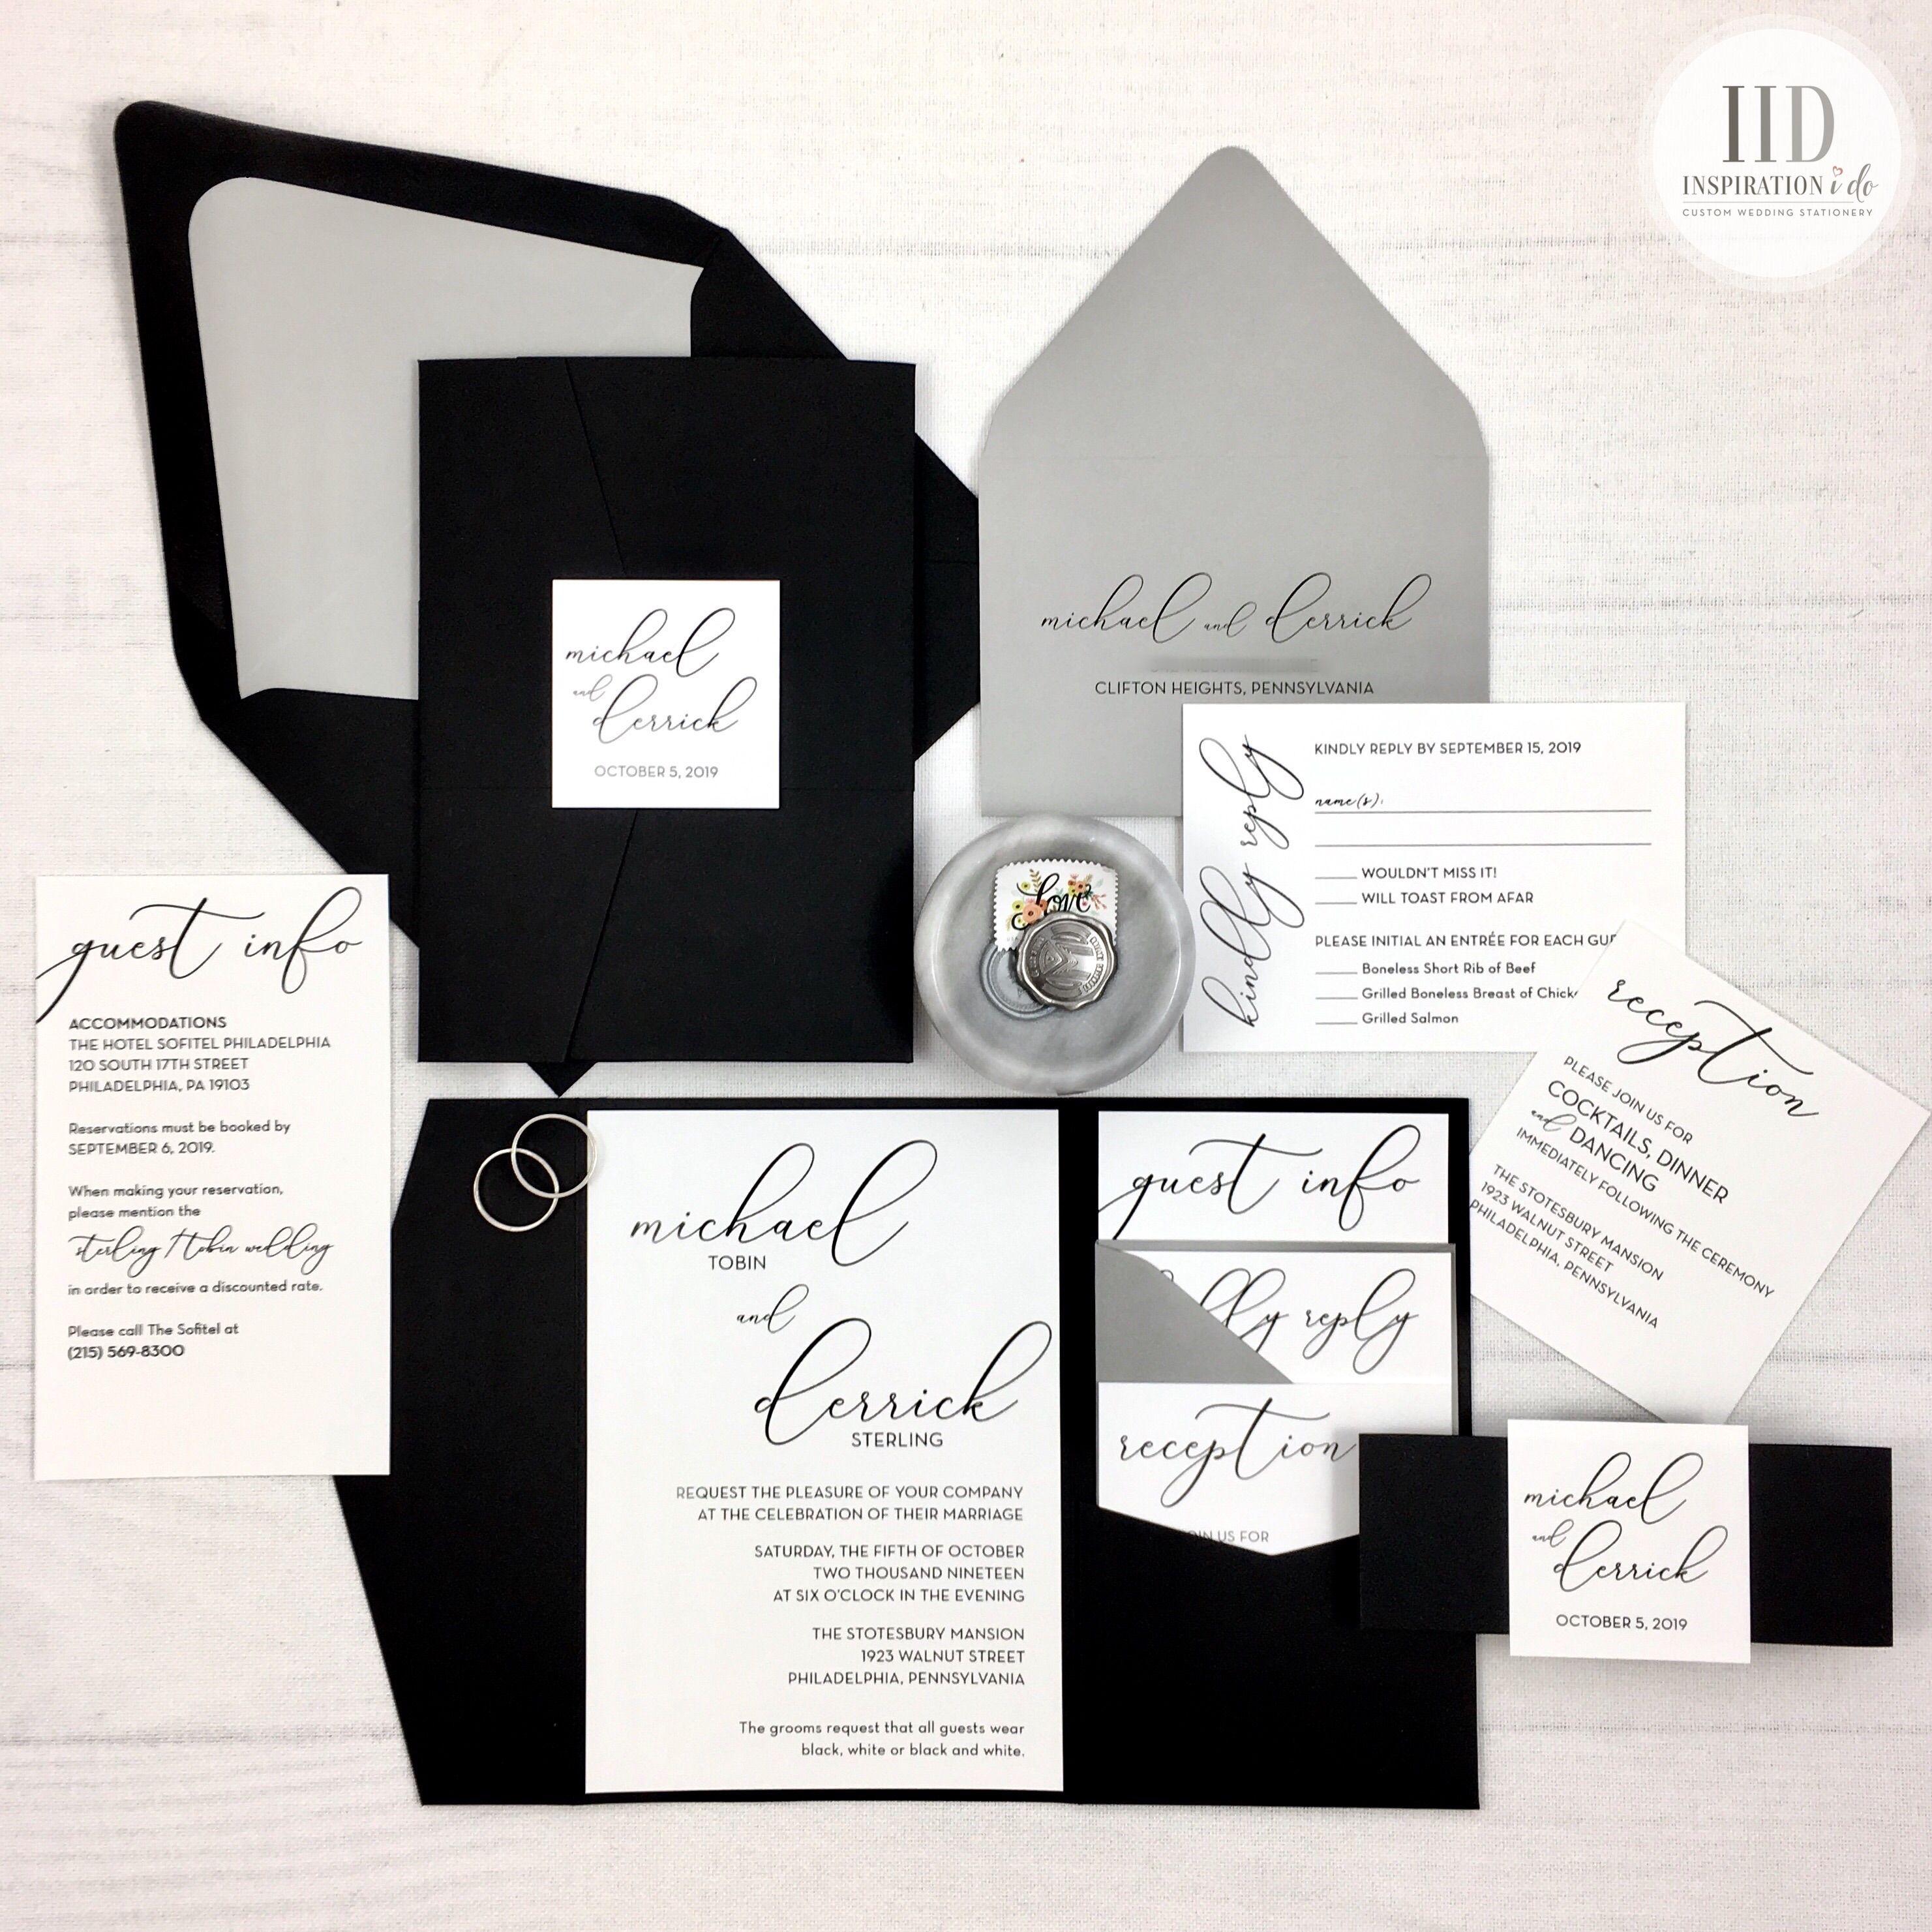 Black And White Pocket Wedding Invitations Black White And Etsy In 2020 Black Wedding Invitations Black And White Wedding Invitations Pocket Wedding Invitations